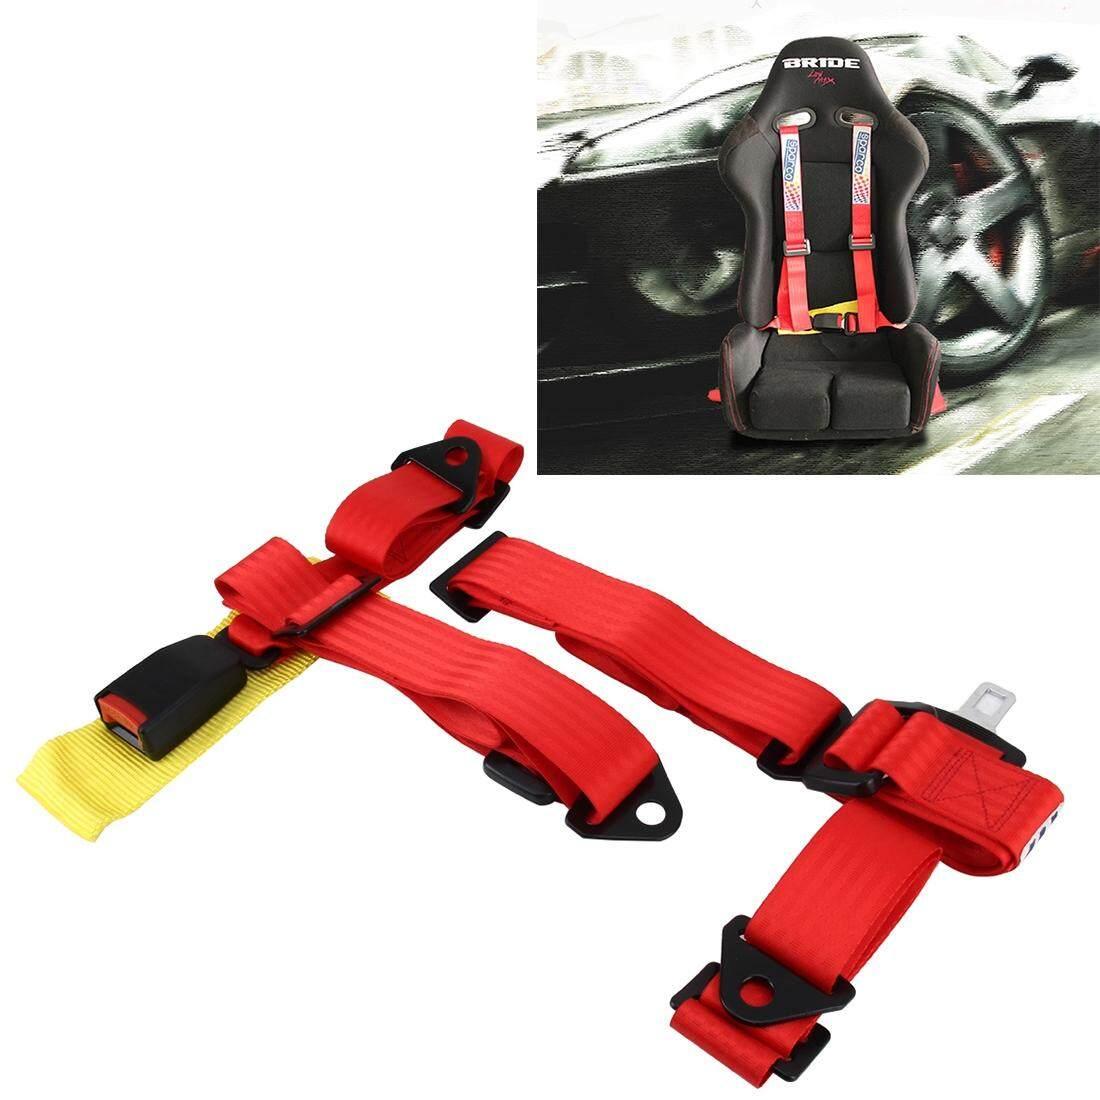 Universal Balap Kendaraan Pengaman Mobil Otomatis Kepala Gesper Harness Racing Sabuk Pengaman Baju Rantai Mobil Drift Balap Penting Ringan Sabuk (Merah) -Intl